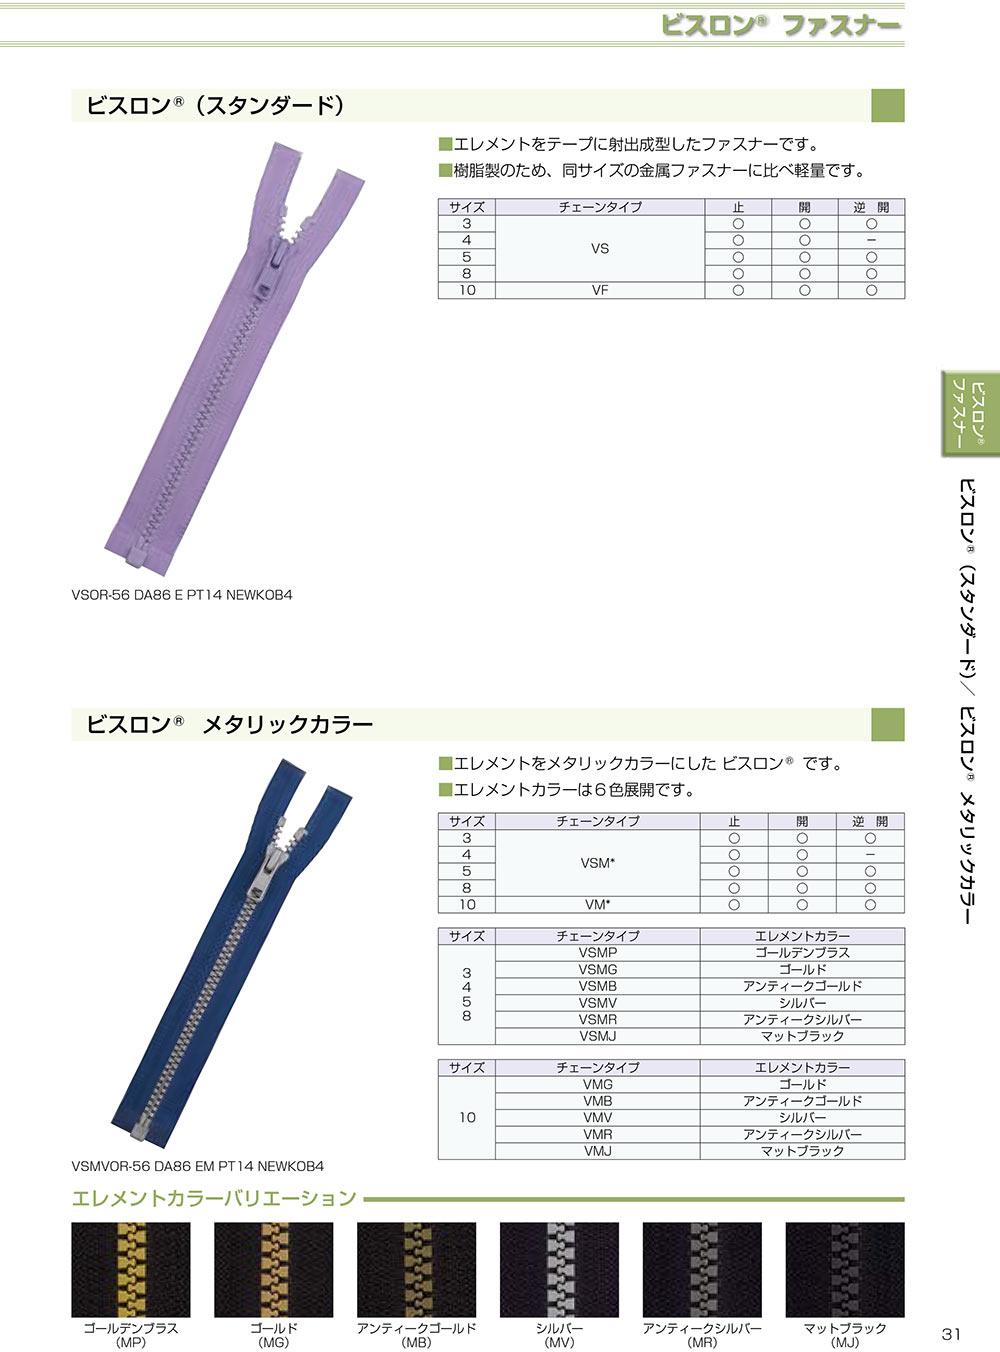 4VSOR YKKビスロンファスナー 4サイズ オープン YKK/オークラ商事 - ApparelX アパレル資材卸通販